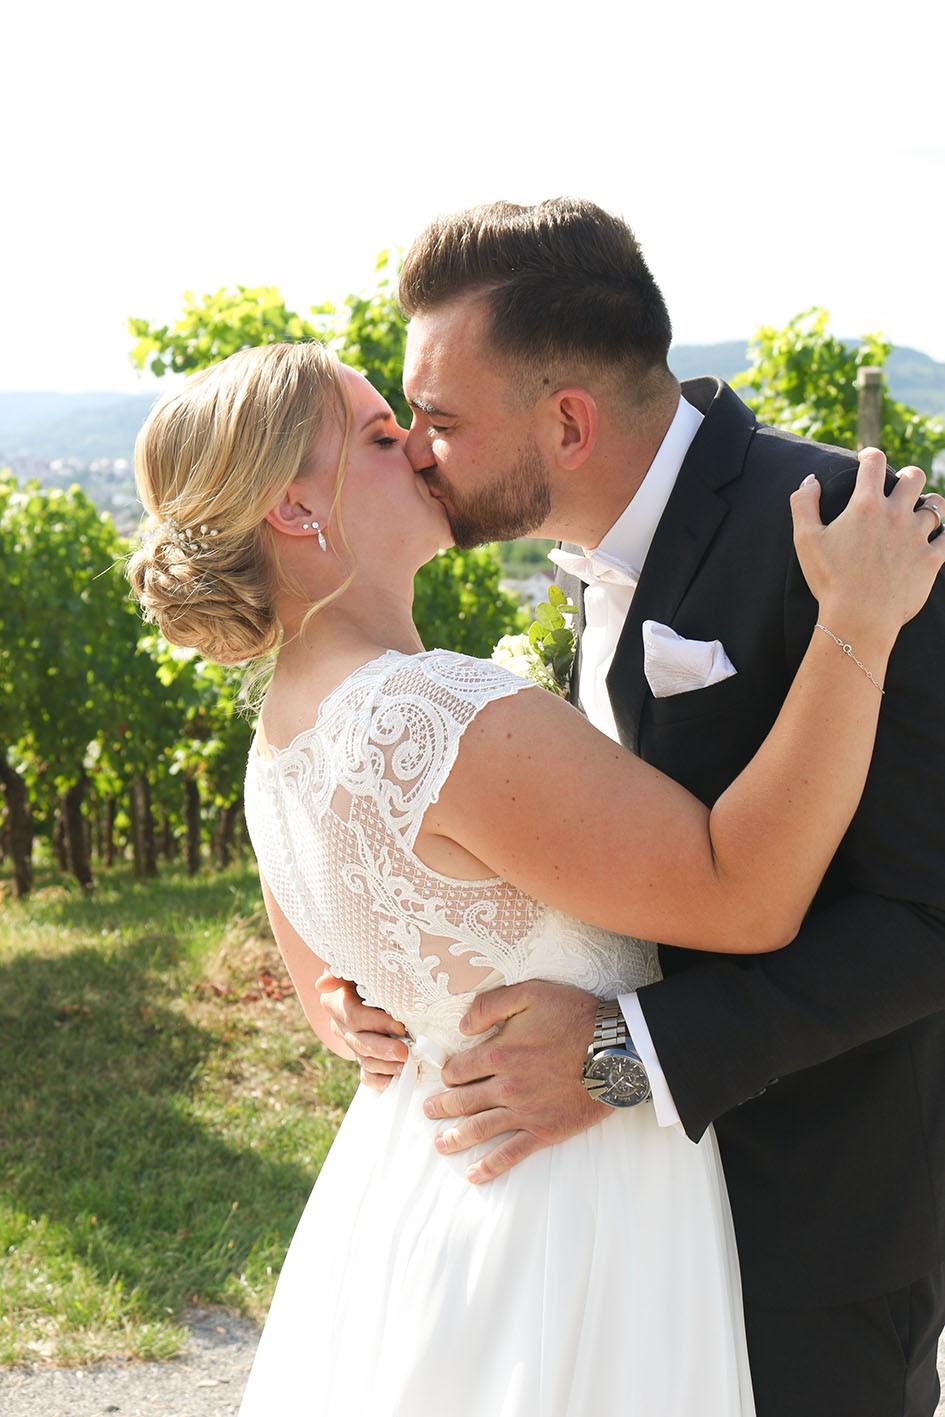 Romantischer Kuss beim First-Look-Shooting.